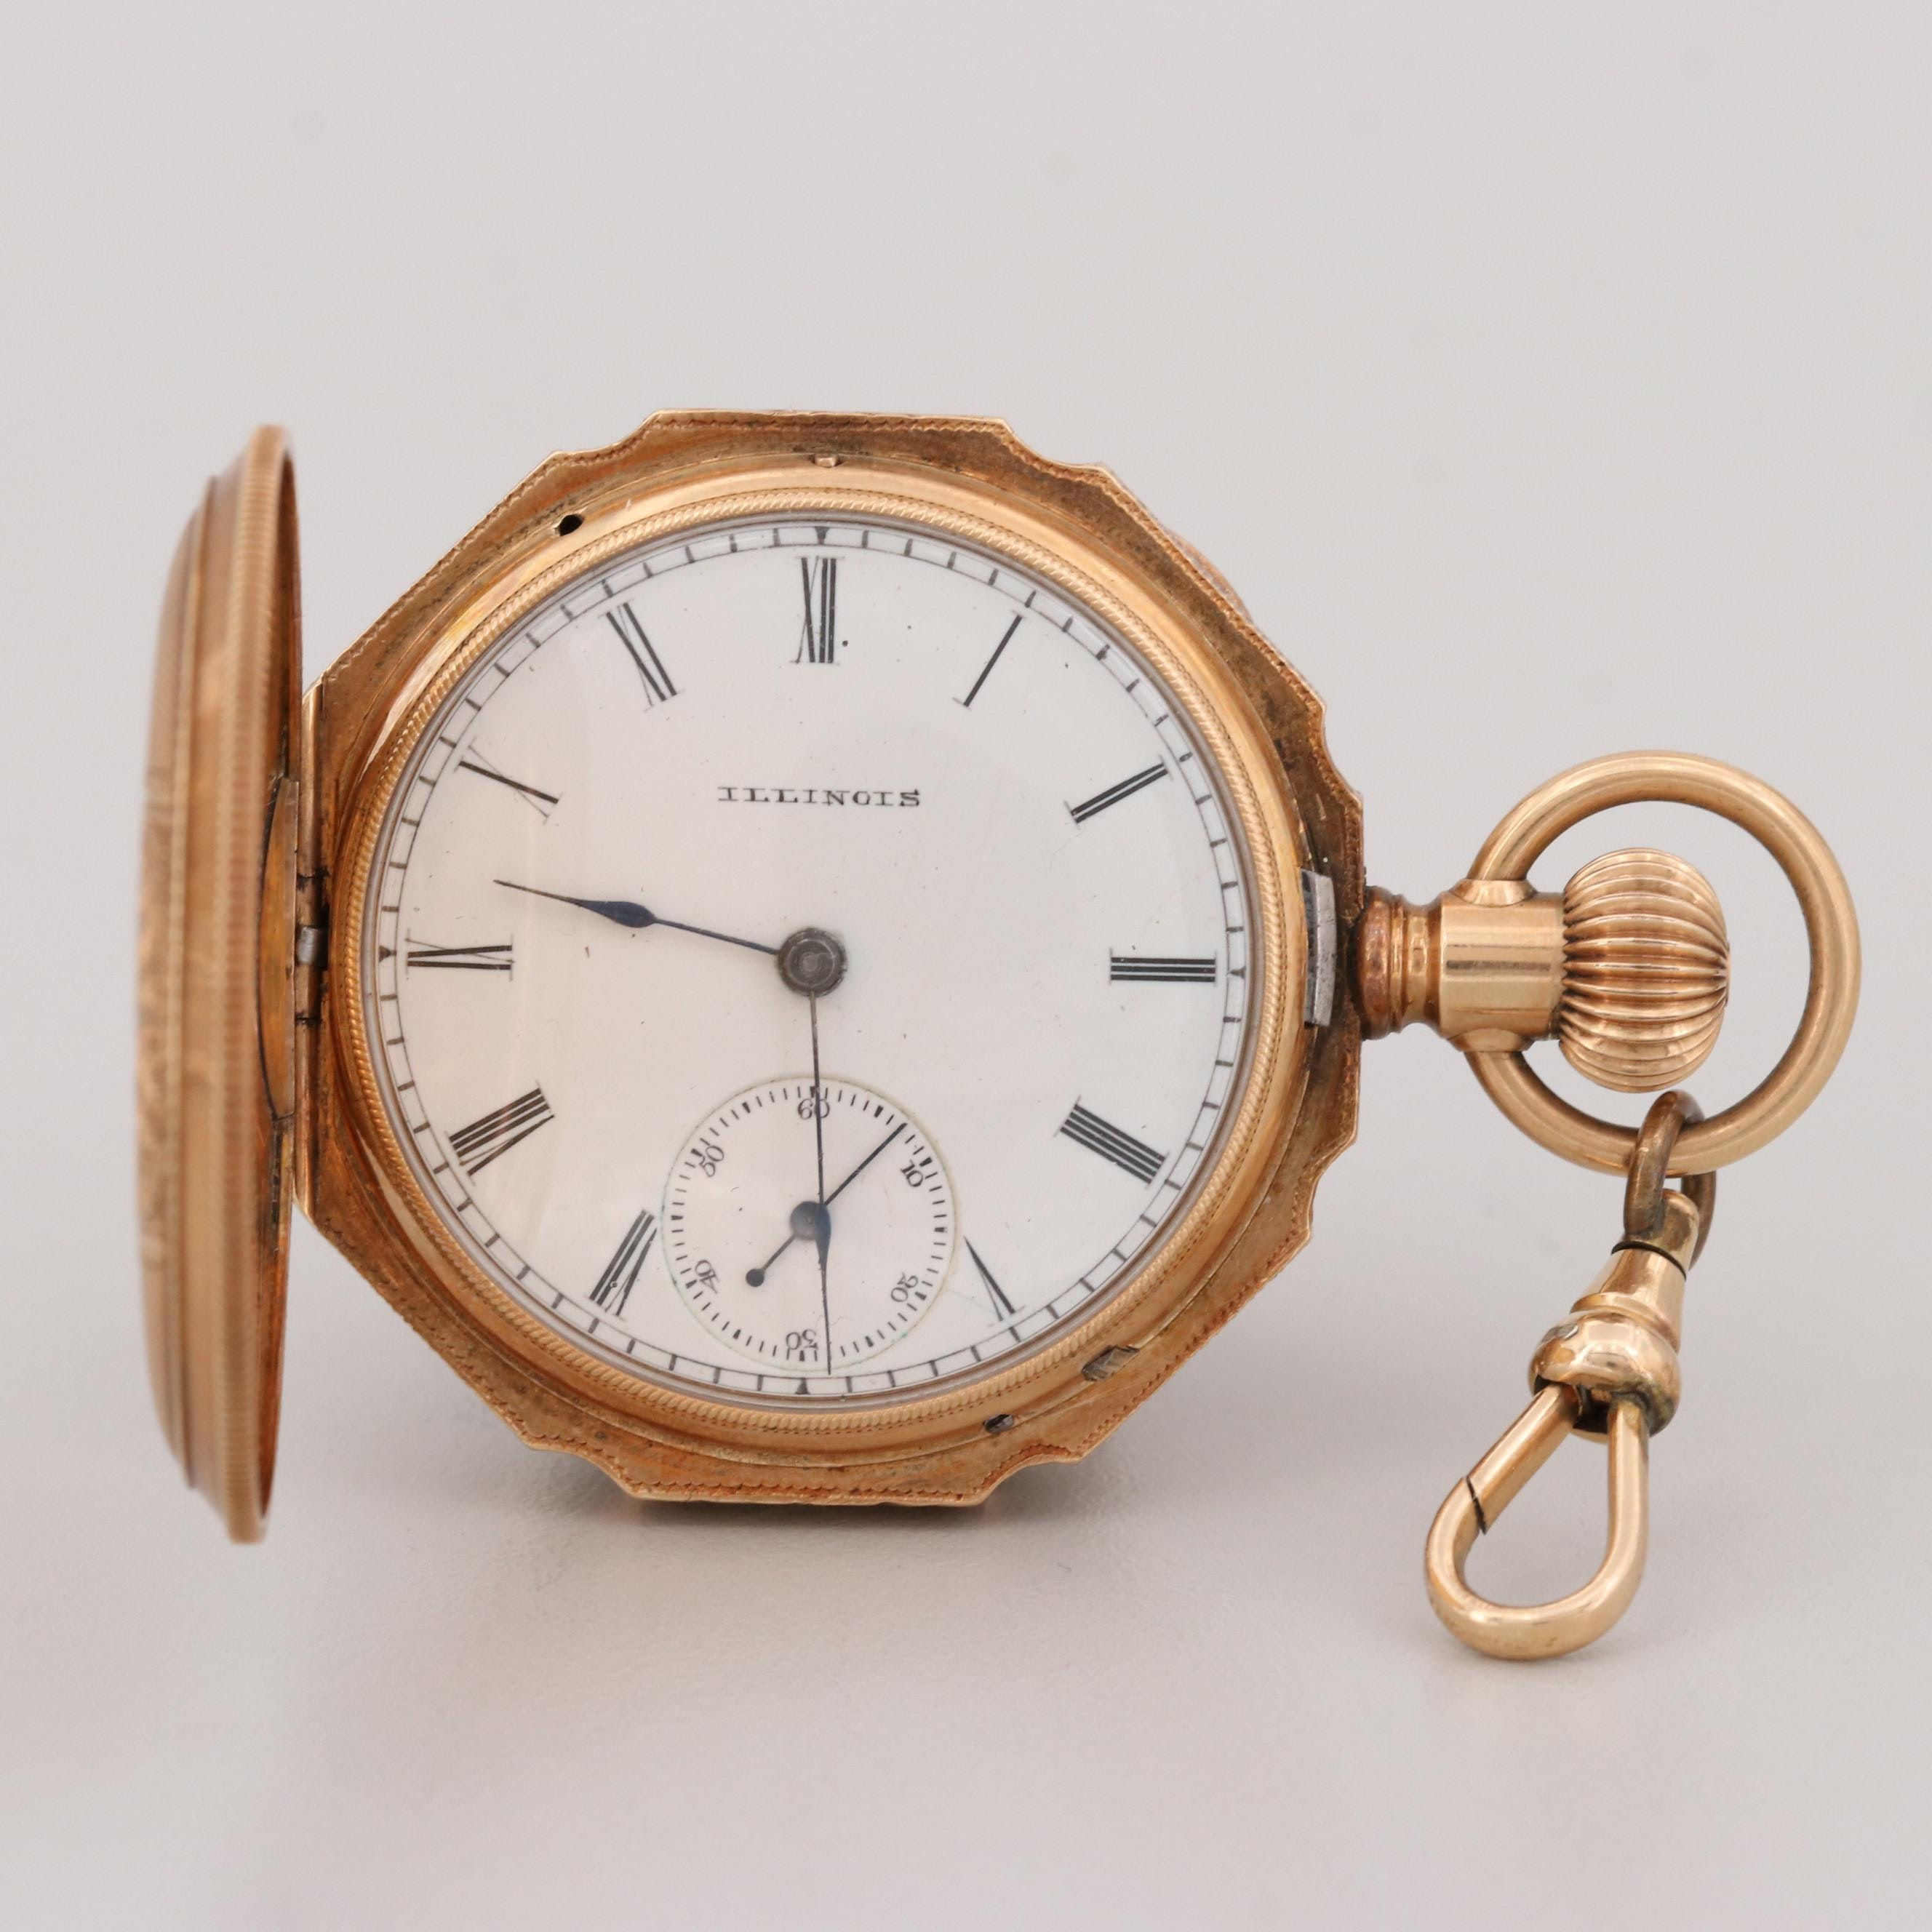 Illinois 14K Yellow Gold Pocket Watch, 1889